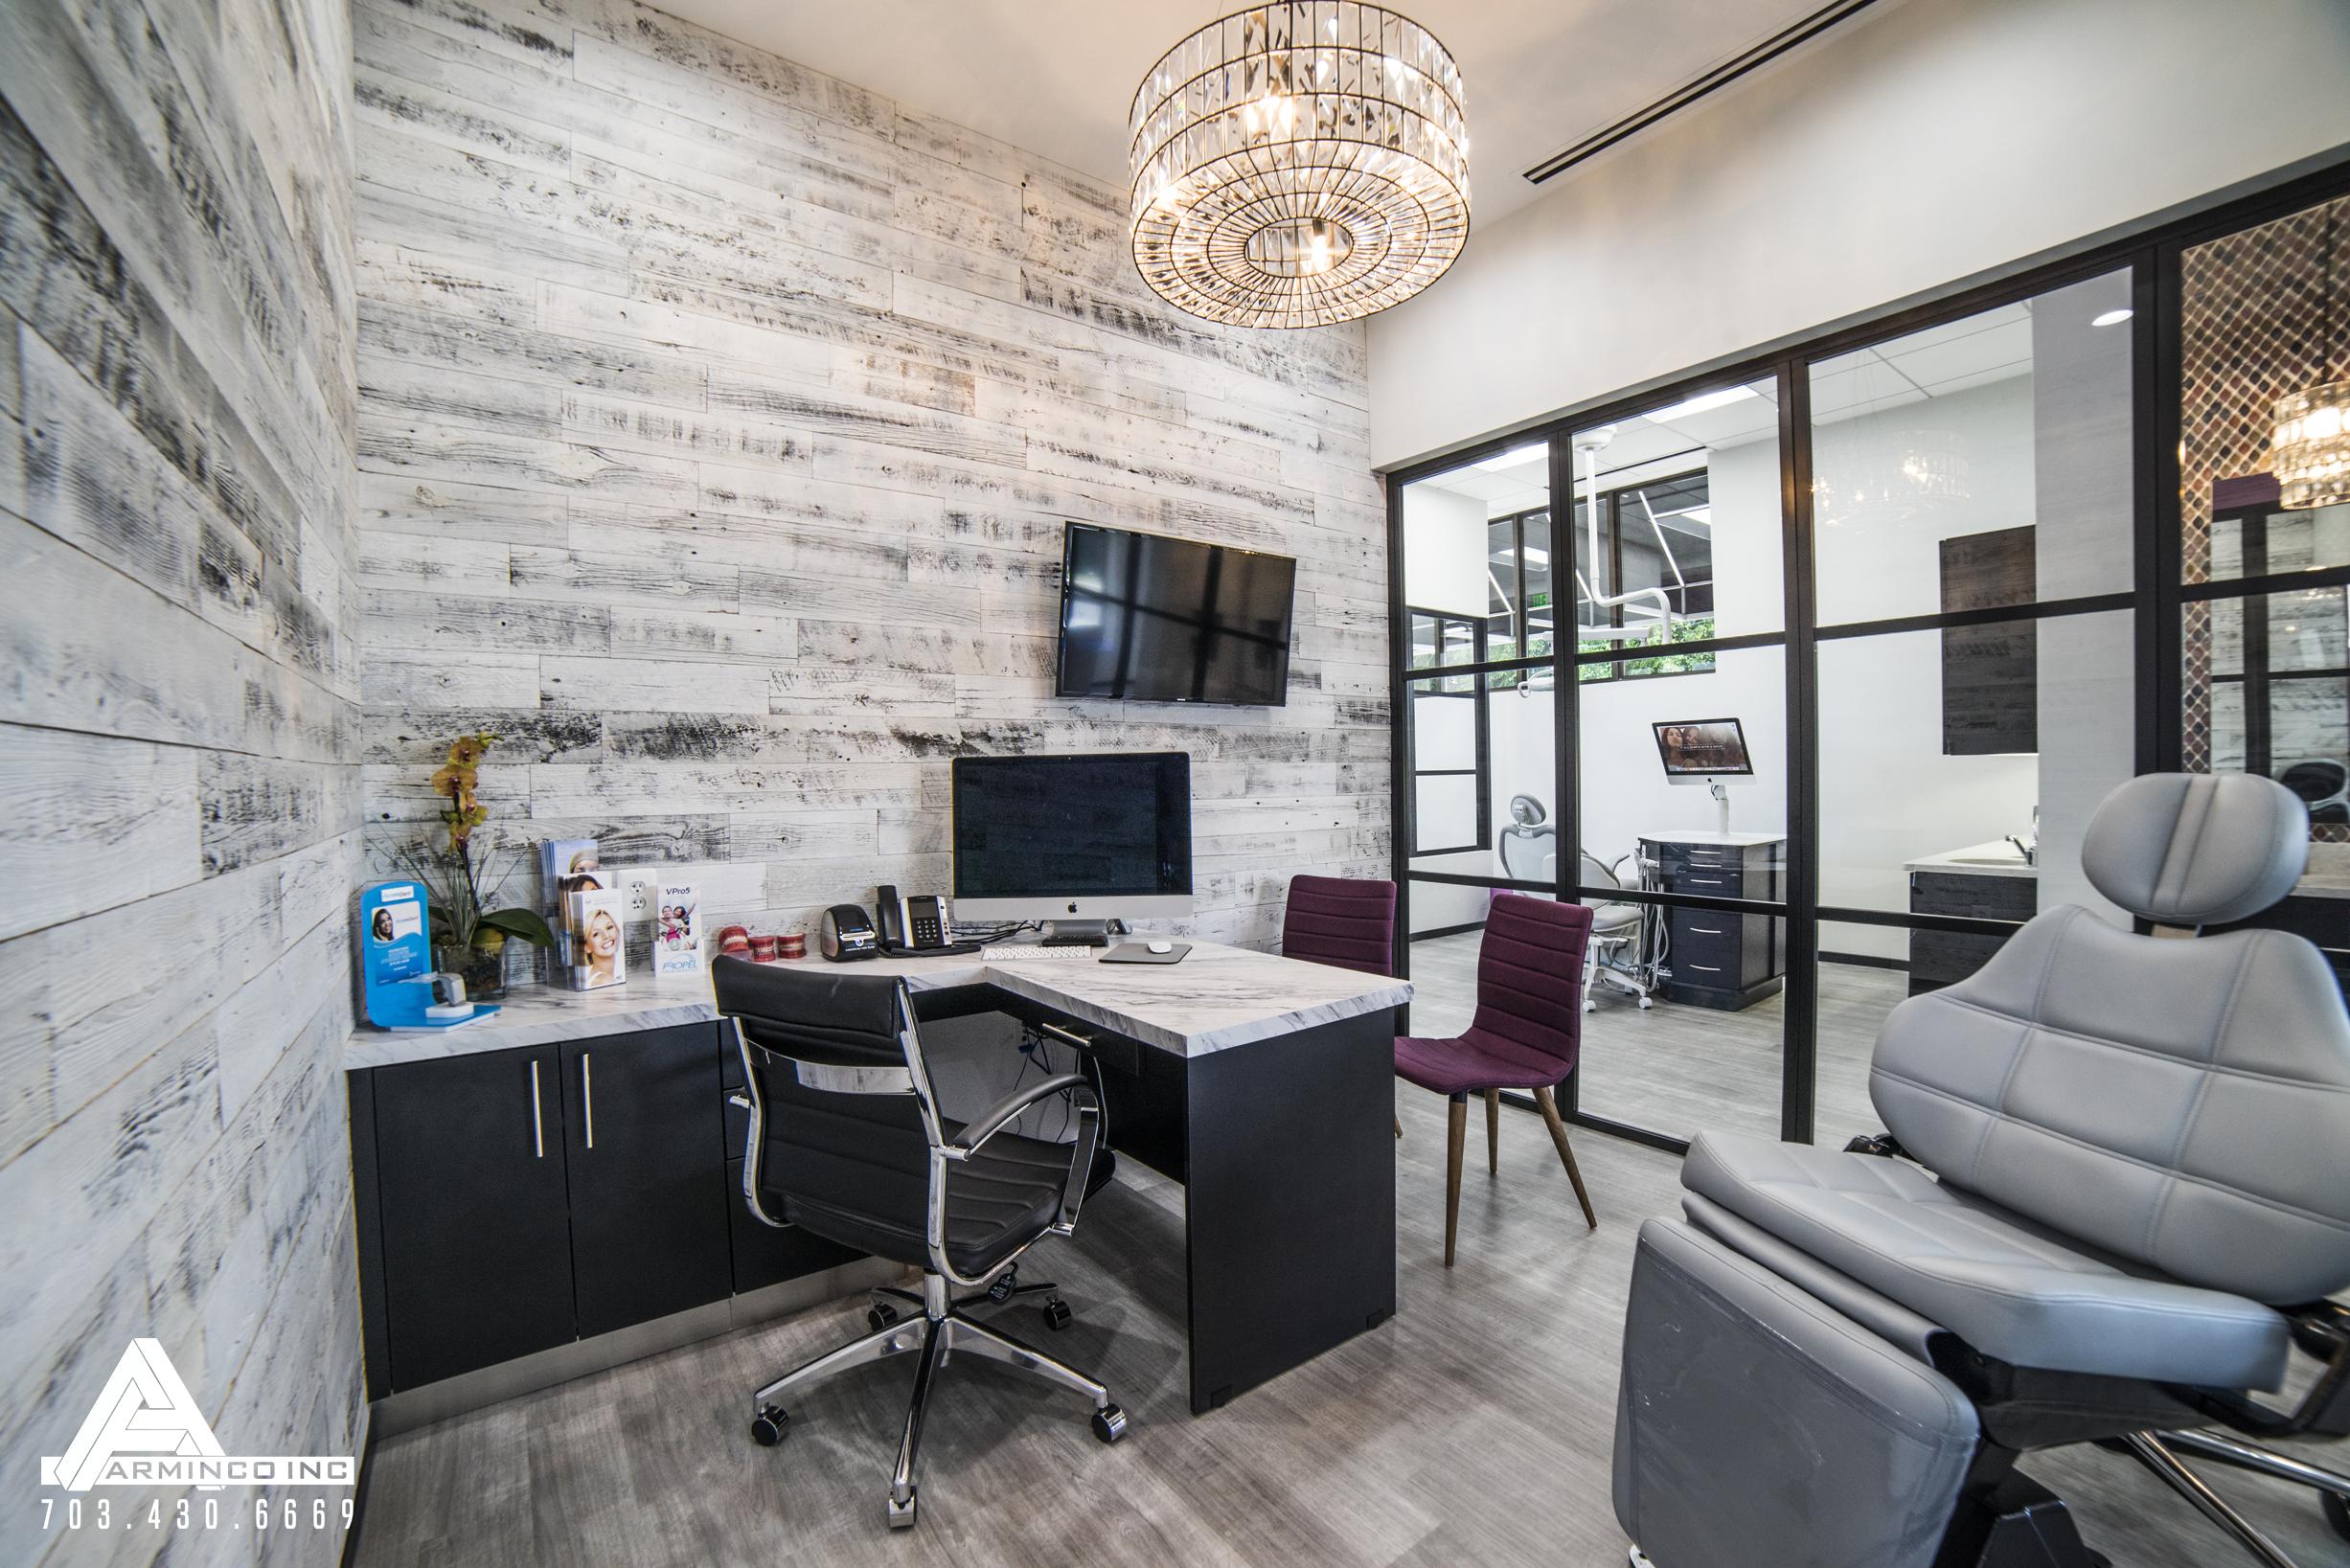 Dental Office Design by Arminco Inc. Consult Dental